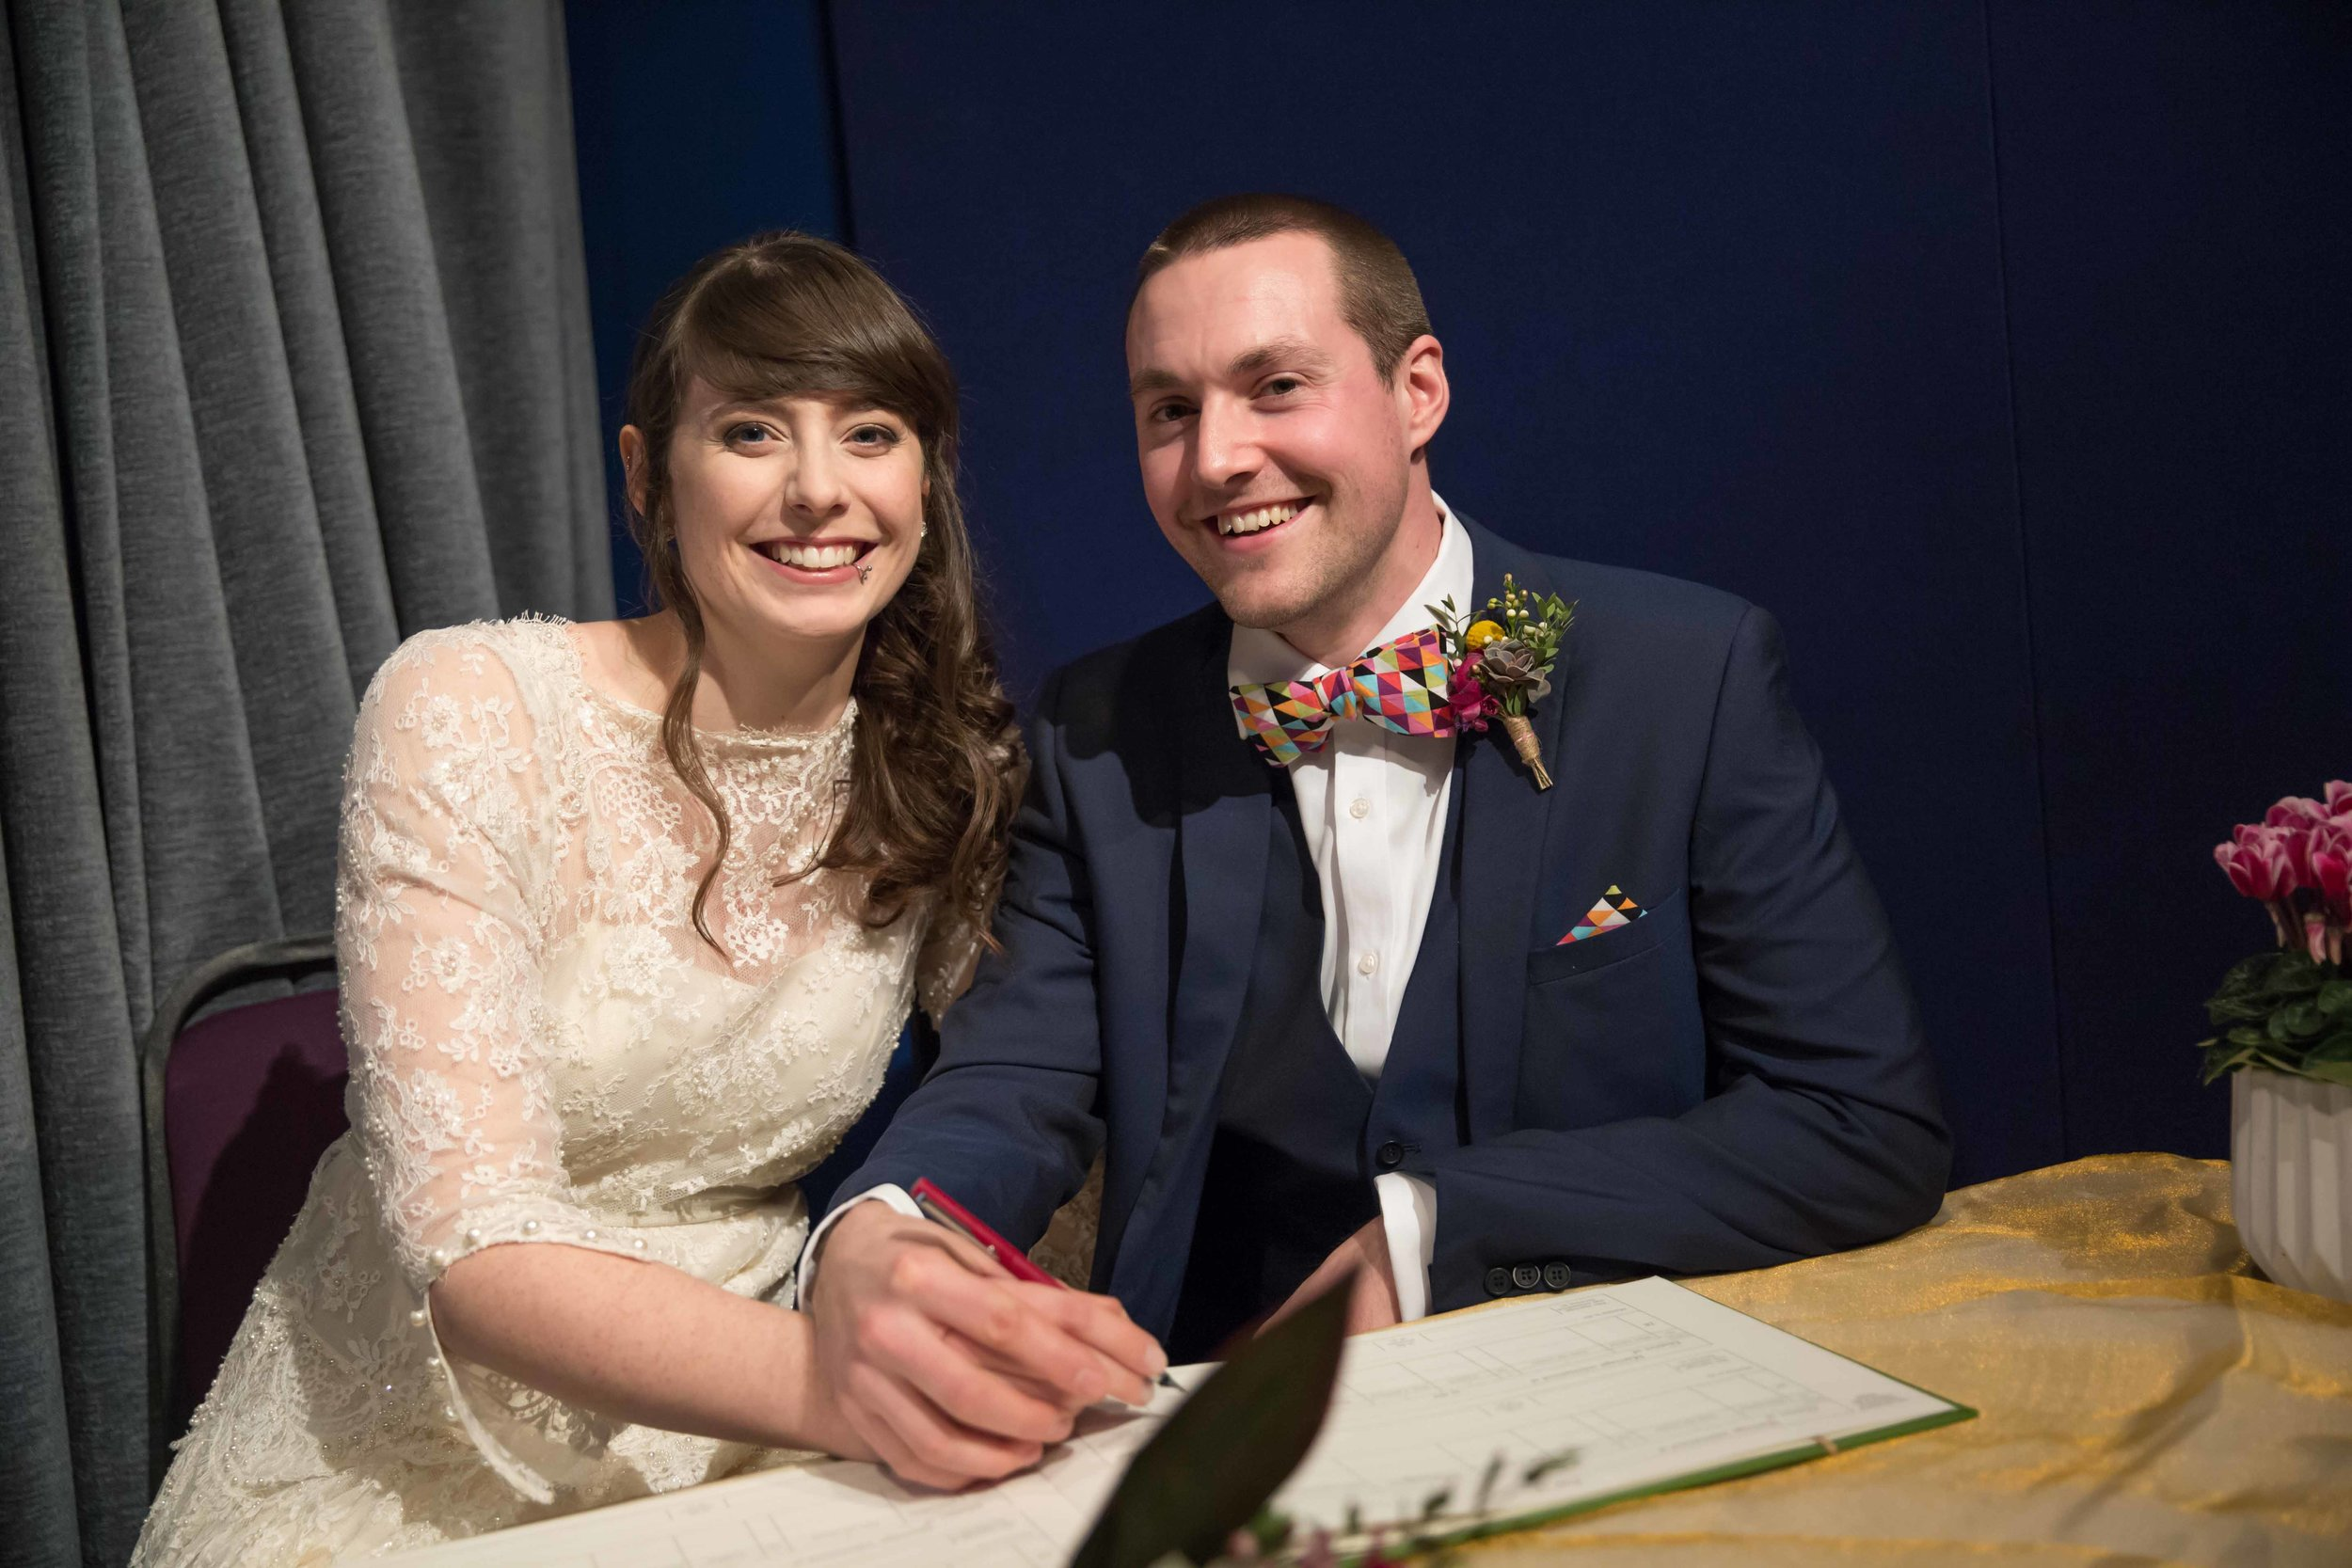 Adam & Faye - Wright Wedding Photography - Bristol Wedding Photographer -135.jpg